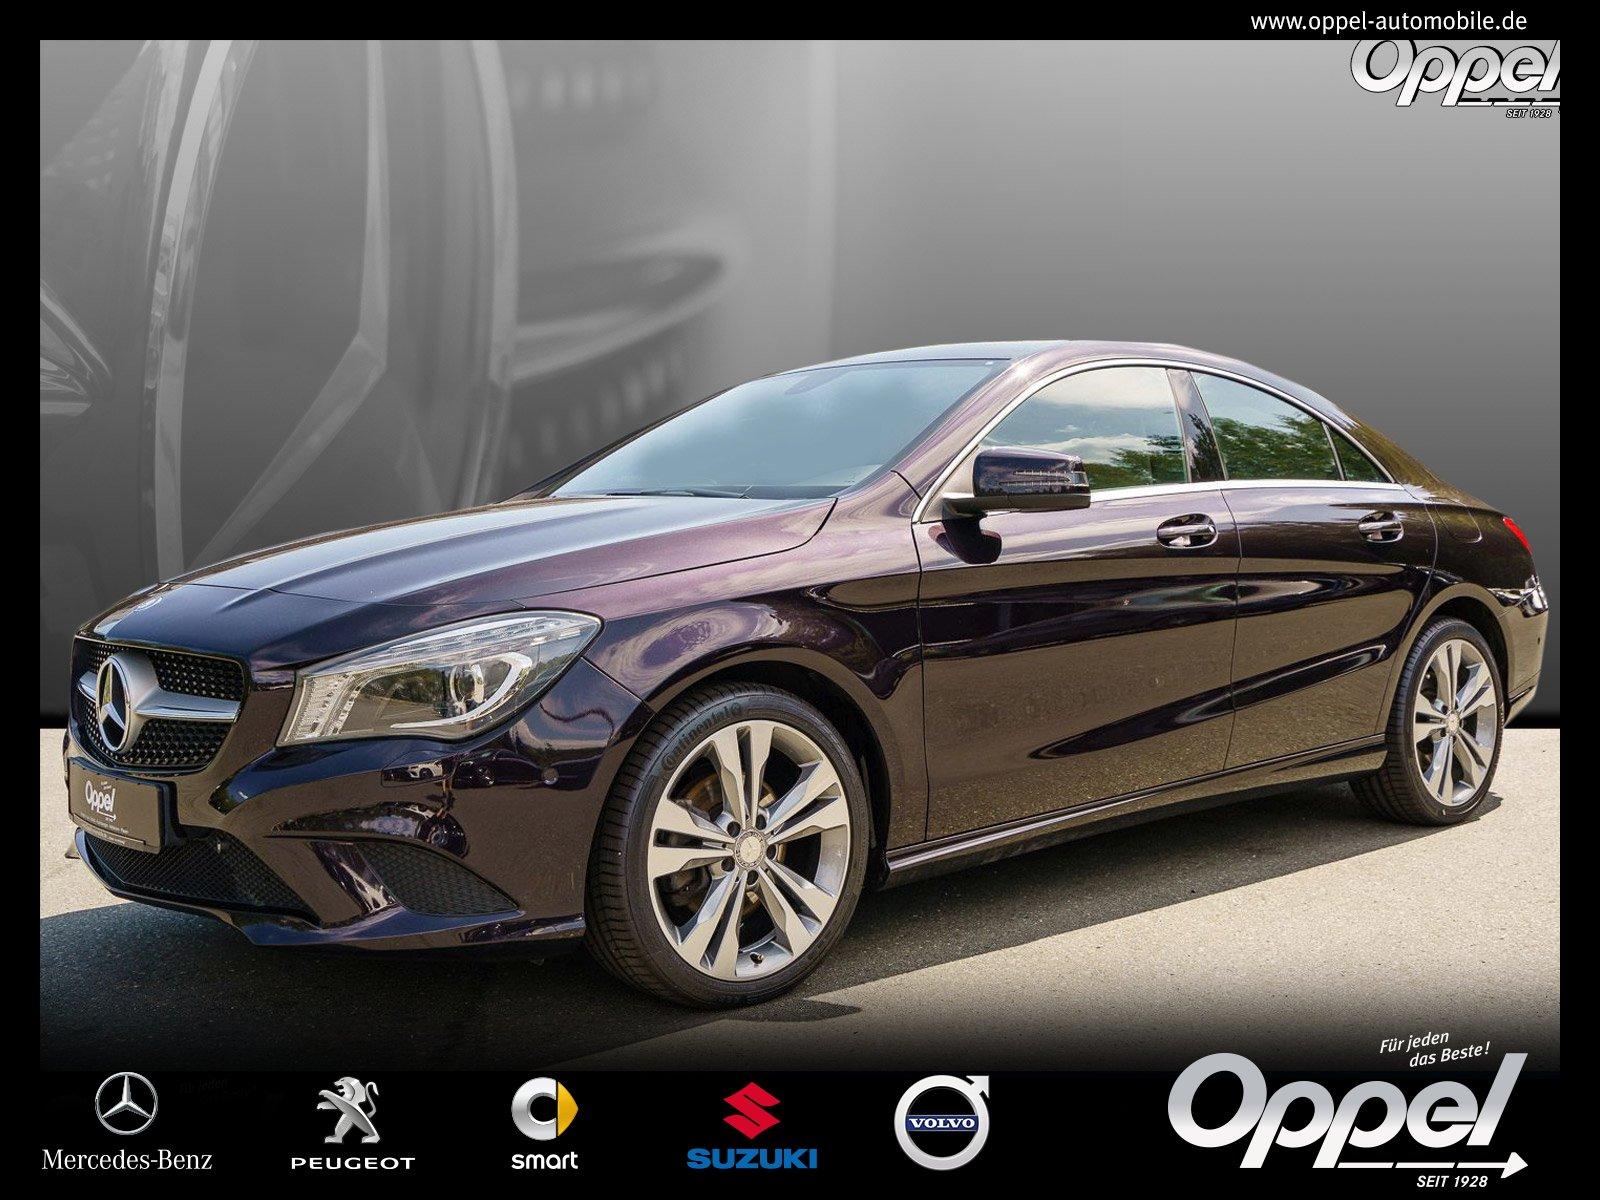 Mercedes-Benz CLA 200 Klima+Navi+Parktr.+SH+LM+Tempo+Bi-Xenon+, Jahr 2013, Benzin